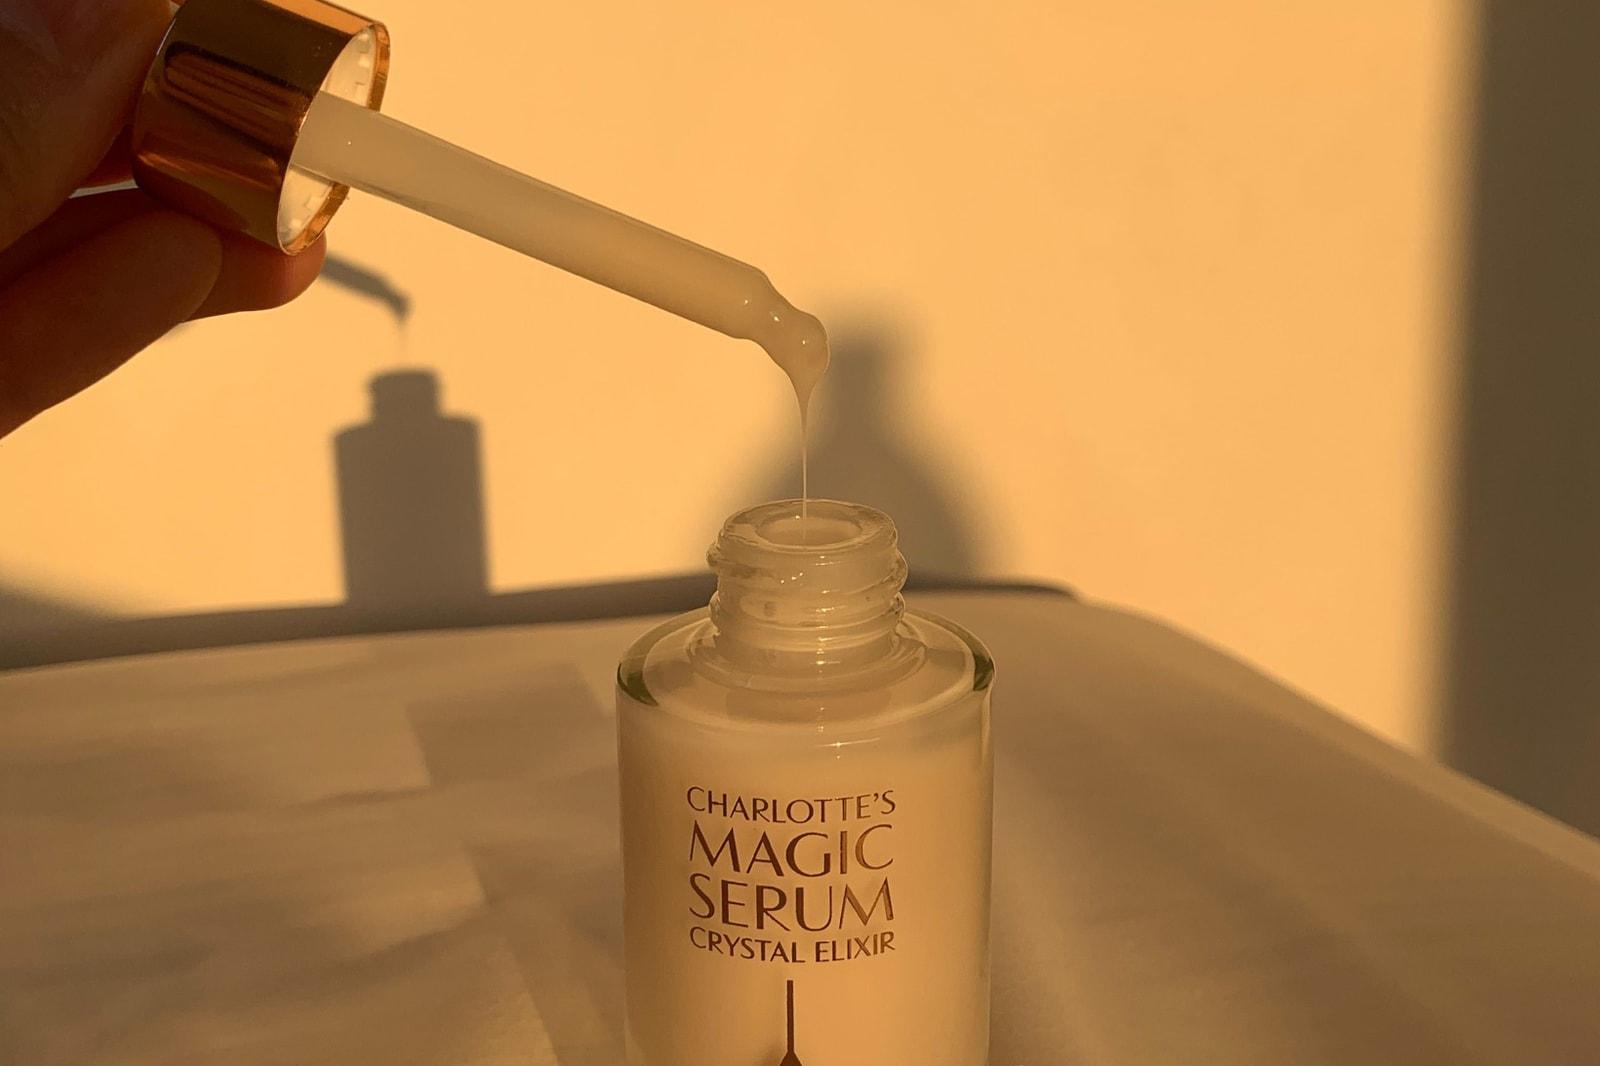 charlotte tilbury magic serum crystal elixir skincare product sunlight formula